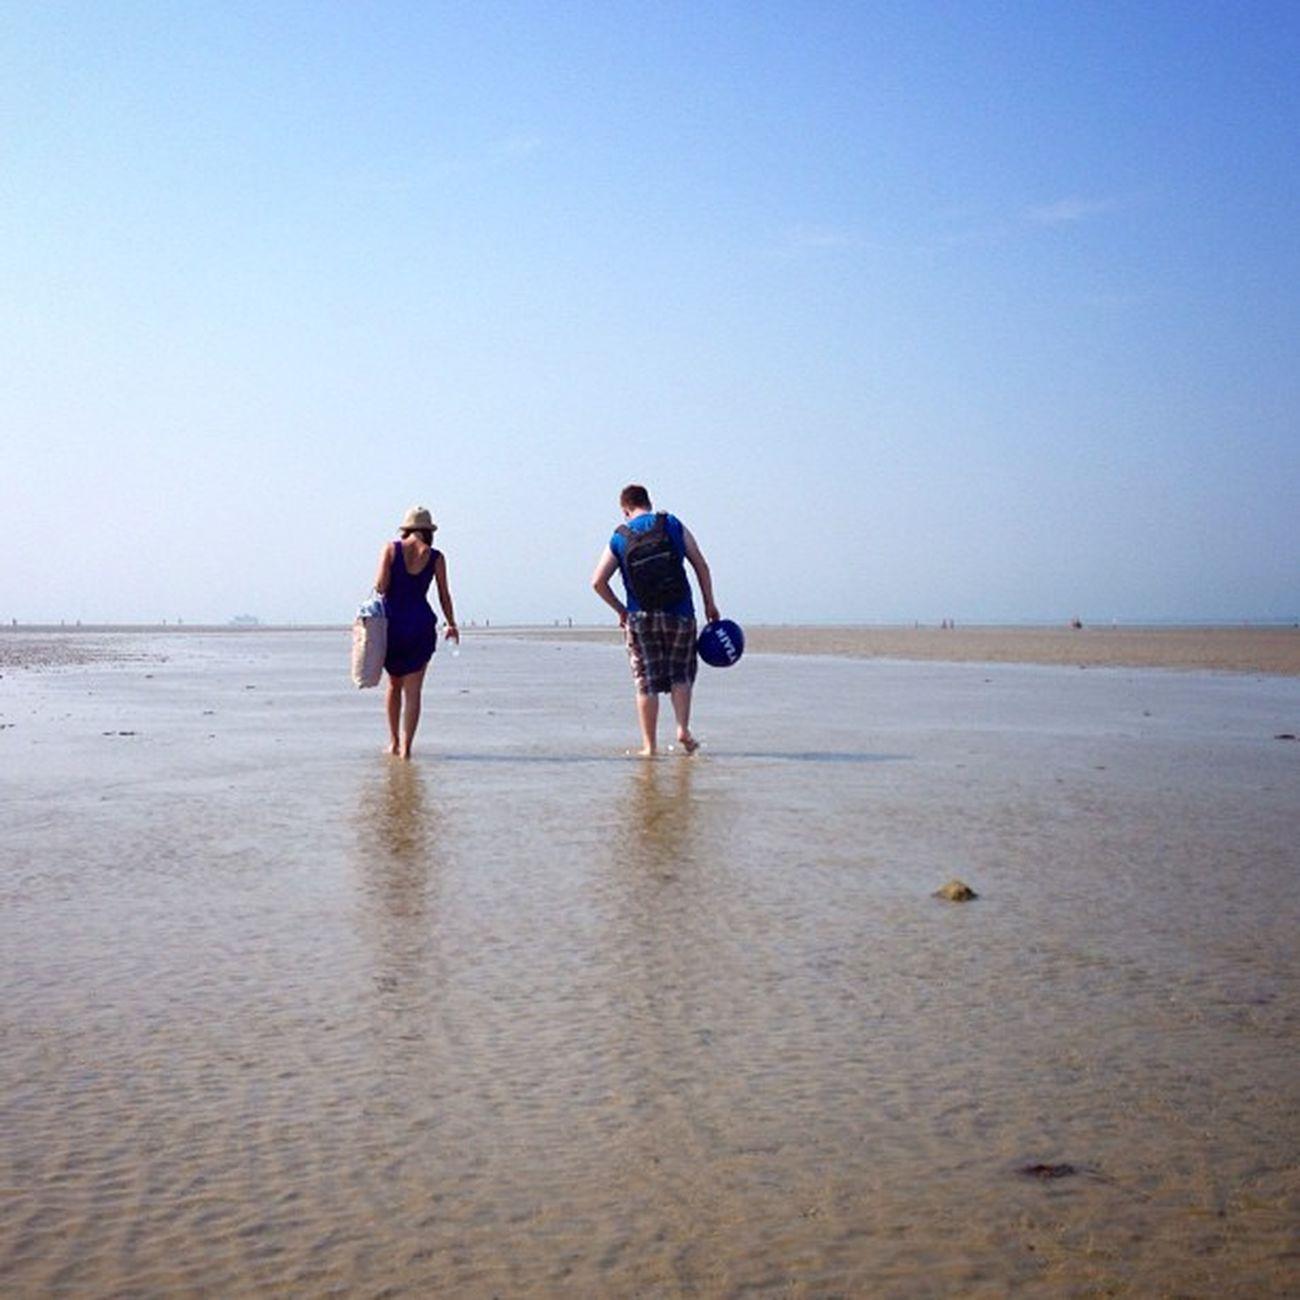 lzemka & keith4594 Walking on the low tide ☀️???☀️#IsleOfWight #aauk #allshots_ #beach #britishsummer #capture_today #gf_uk #gi_uk #gang_family #ic_water #ic_cities #o2travel #rydebeach #summer #yourturnbritain Capture_today Loveyoursummer Summer Yourturnbritain Beach Isleofwight Rydebeach Gang_family Britishsummer Ic_water Allshots_ Ic_cities Gf_uk O2travel Gi_uk Aauk